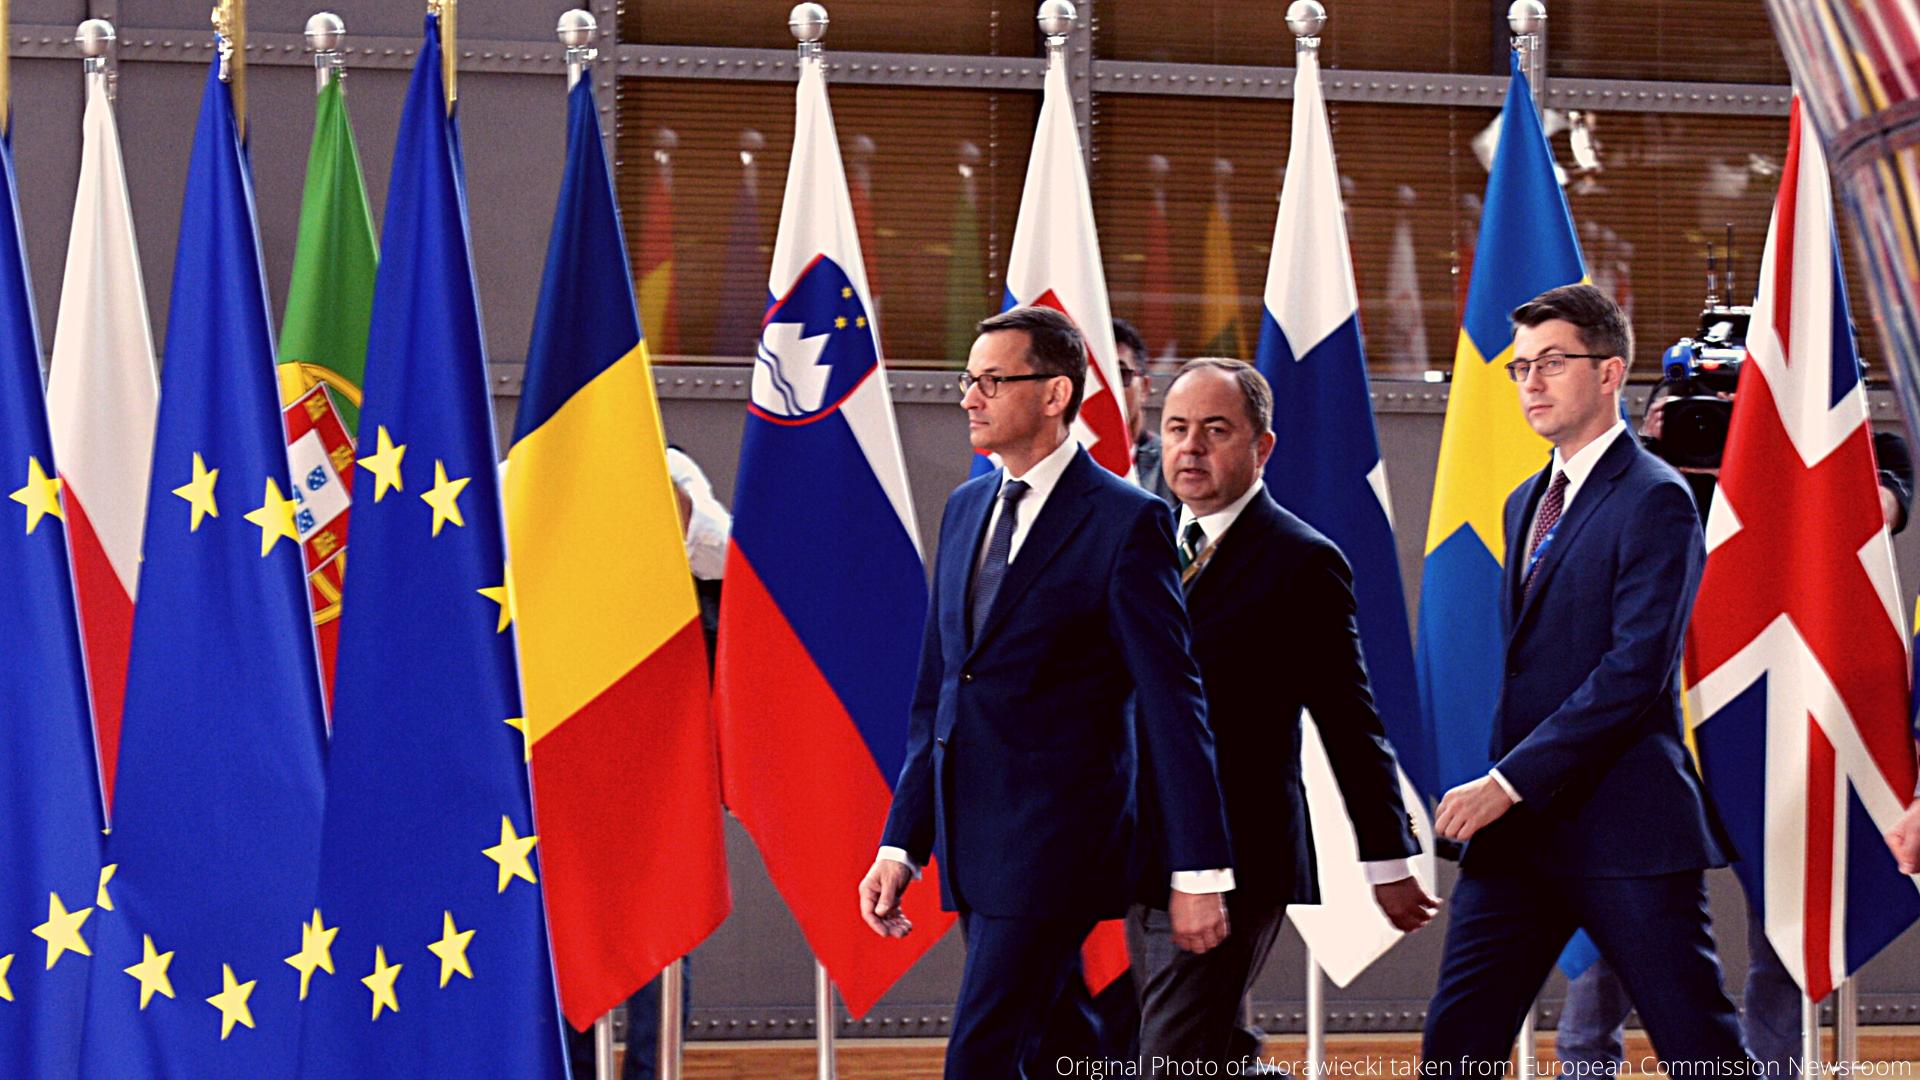 Original Photo of Morawiecki taken from European Commission Newsroom